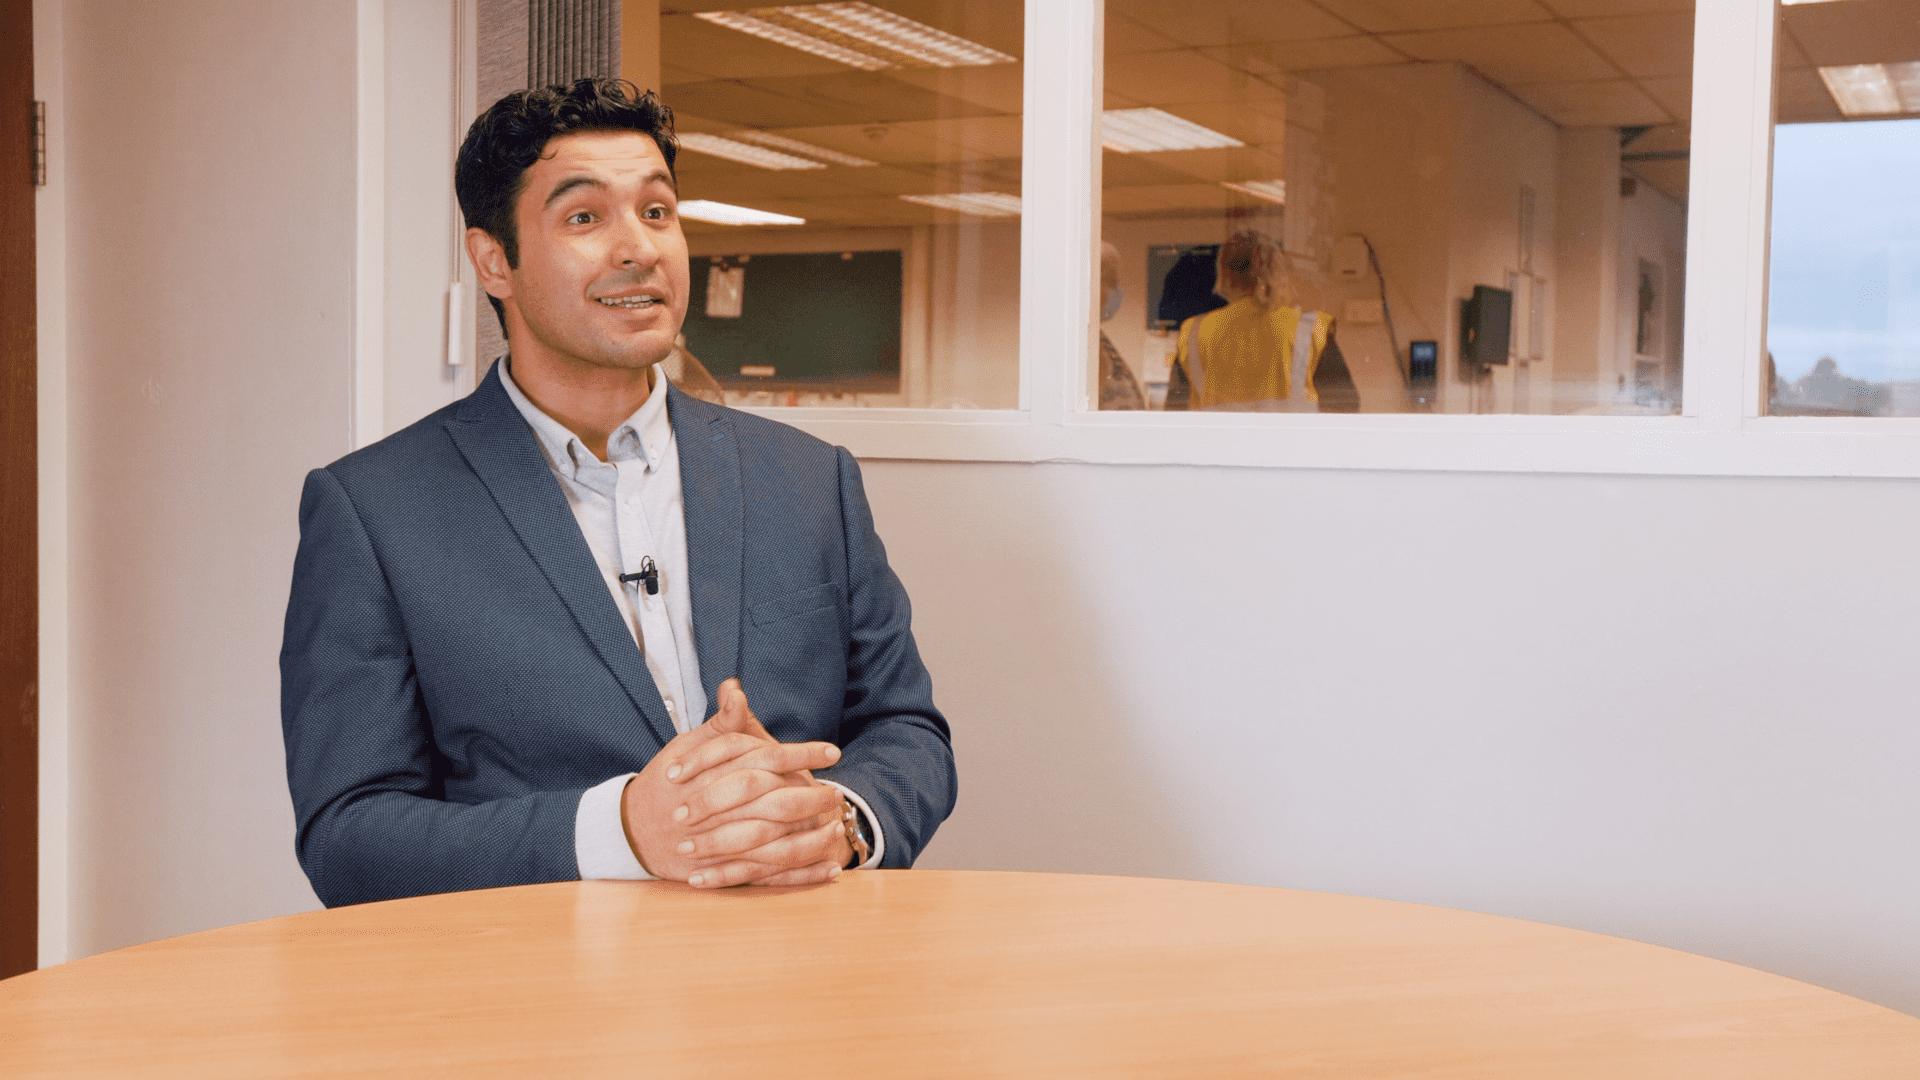 Ahmed Alainiah of Talbott's Biomass Energy Systems Ltd talks about the Flowlens MRP system